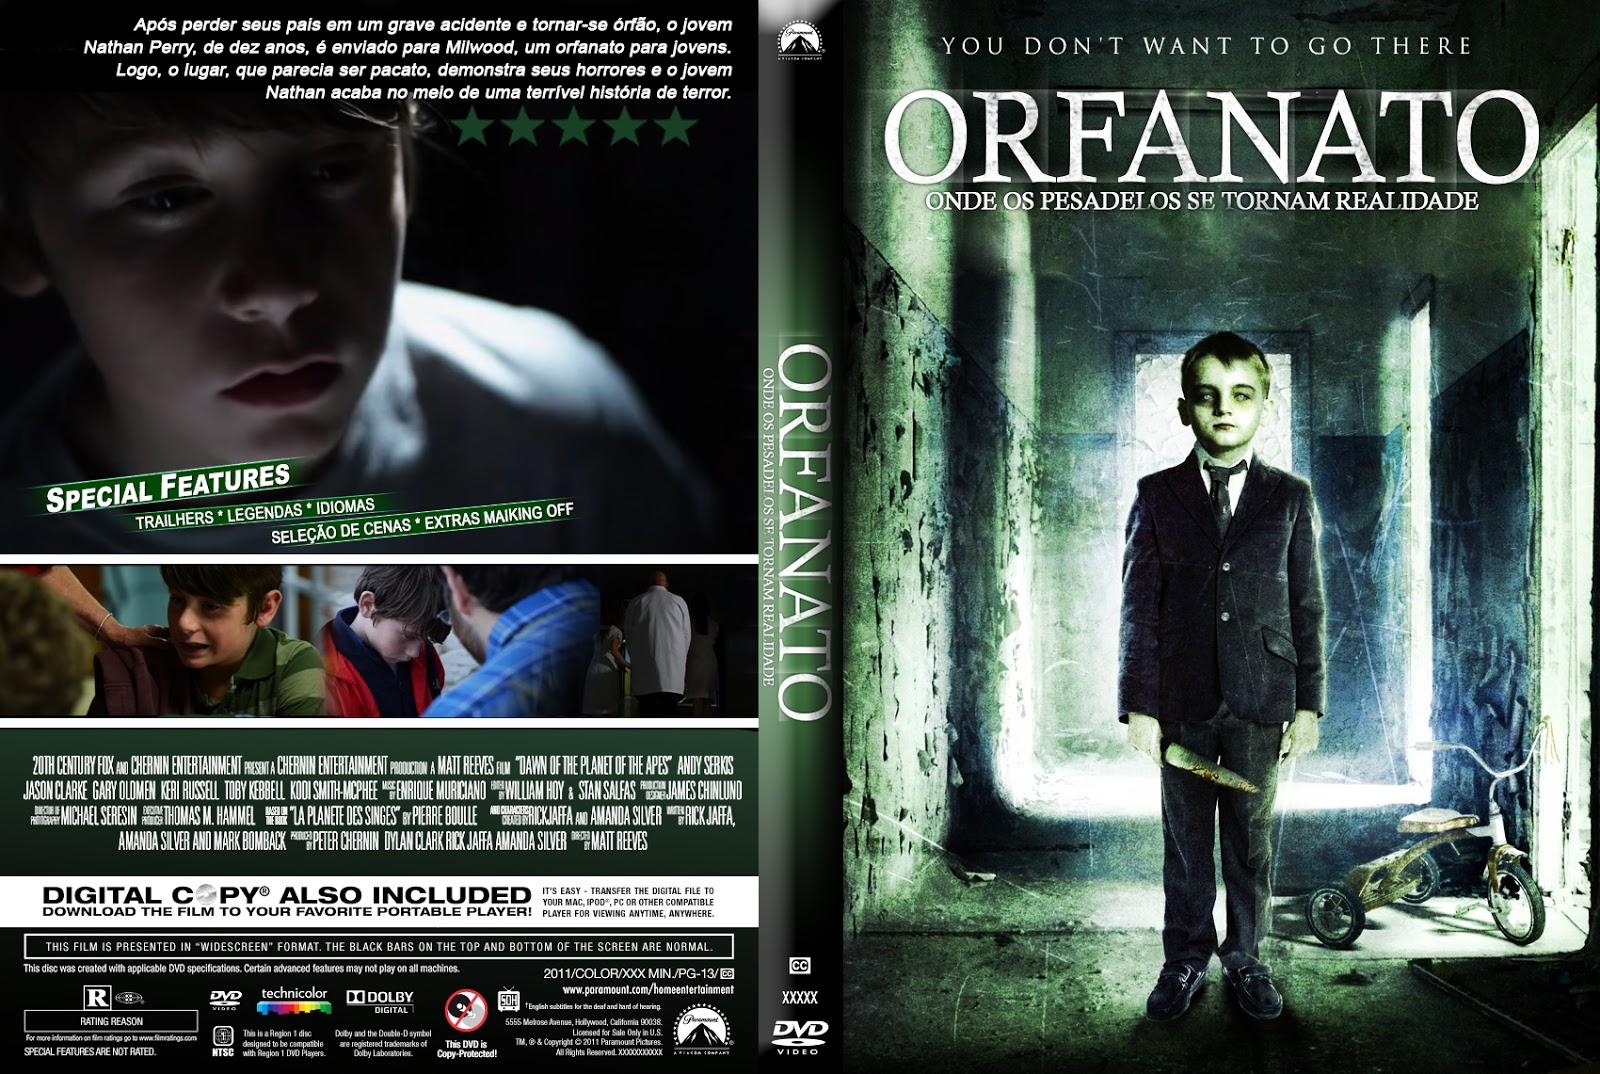 Orfanato Onde os Pesadelos se Tornam Realidade DVDRip XviD Dublado Orfanato 2B  2BXANDAODOWNLOAD